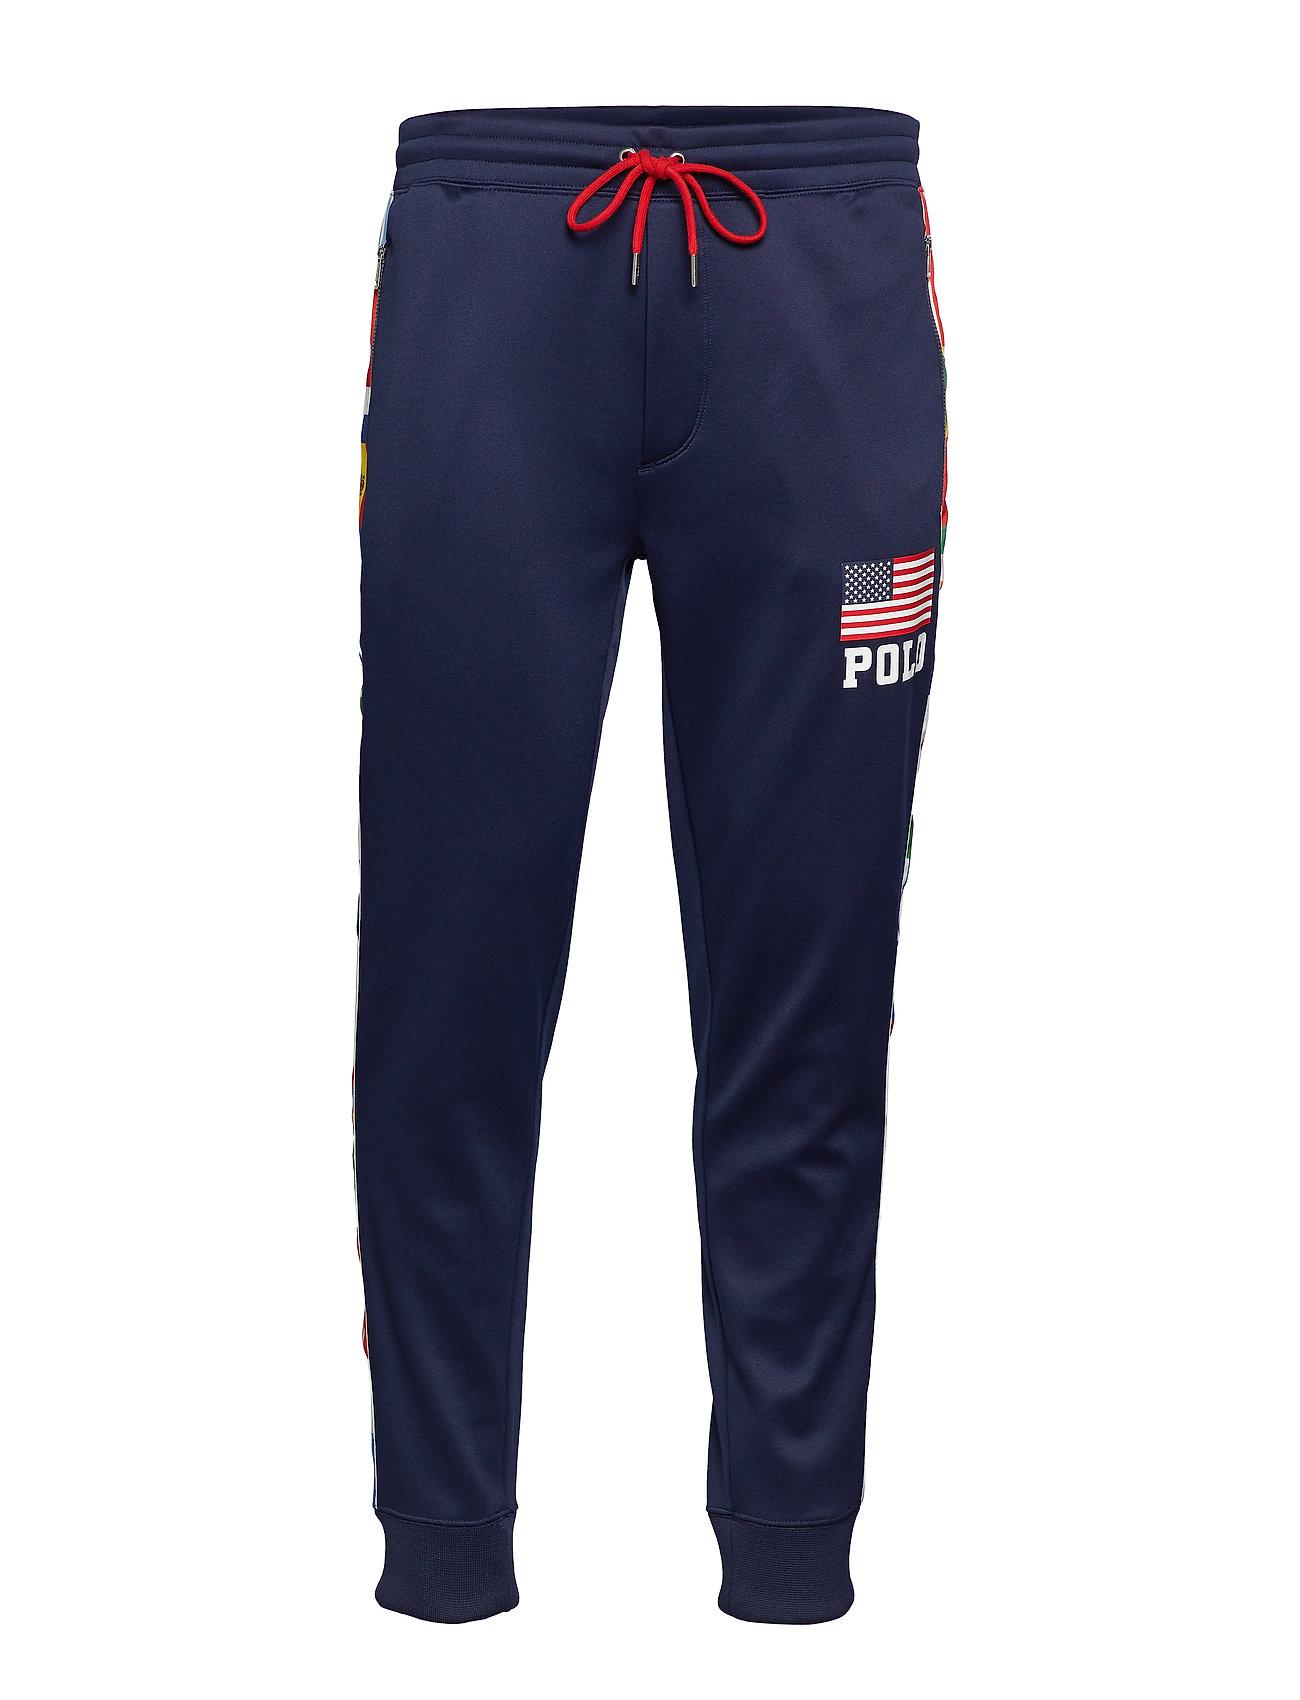 Polo Ralph Lauren Performance Fleece Track Pant